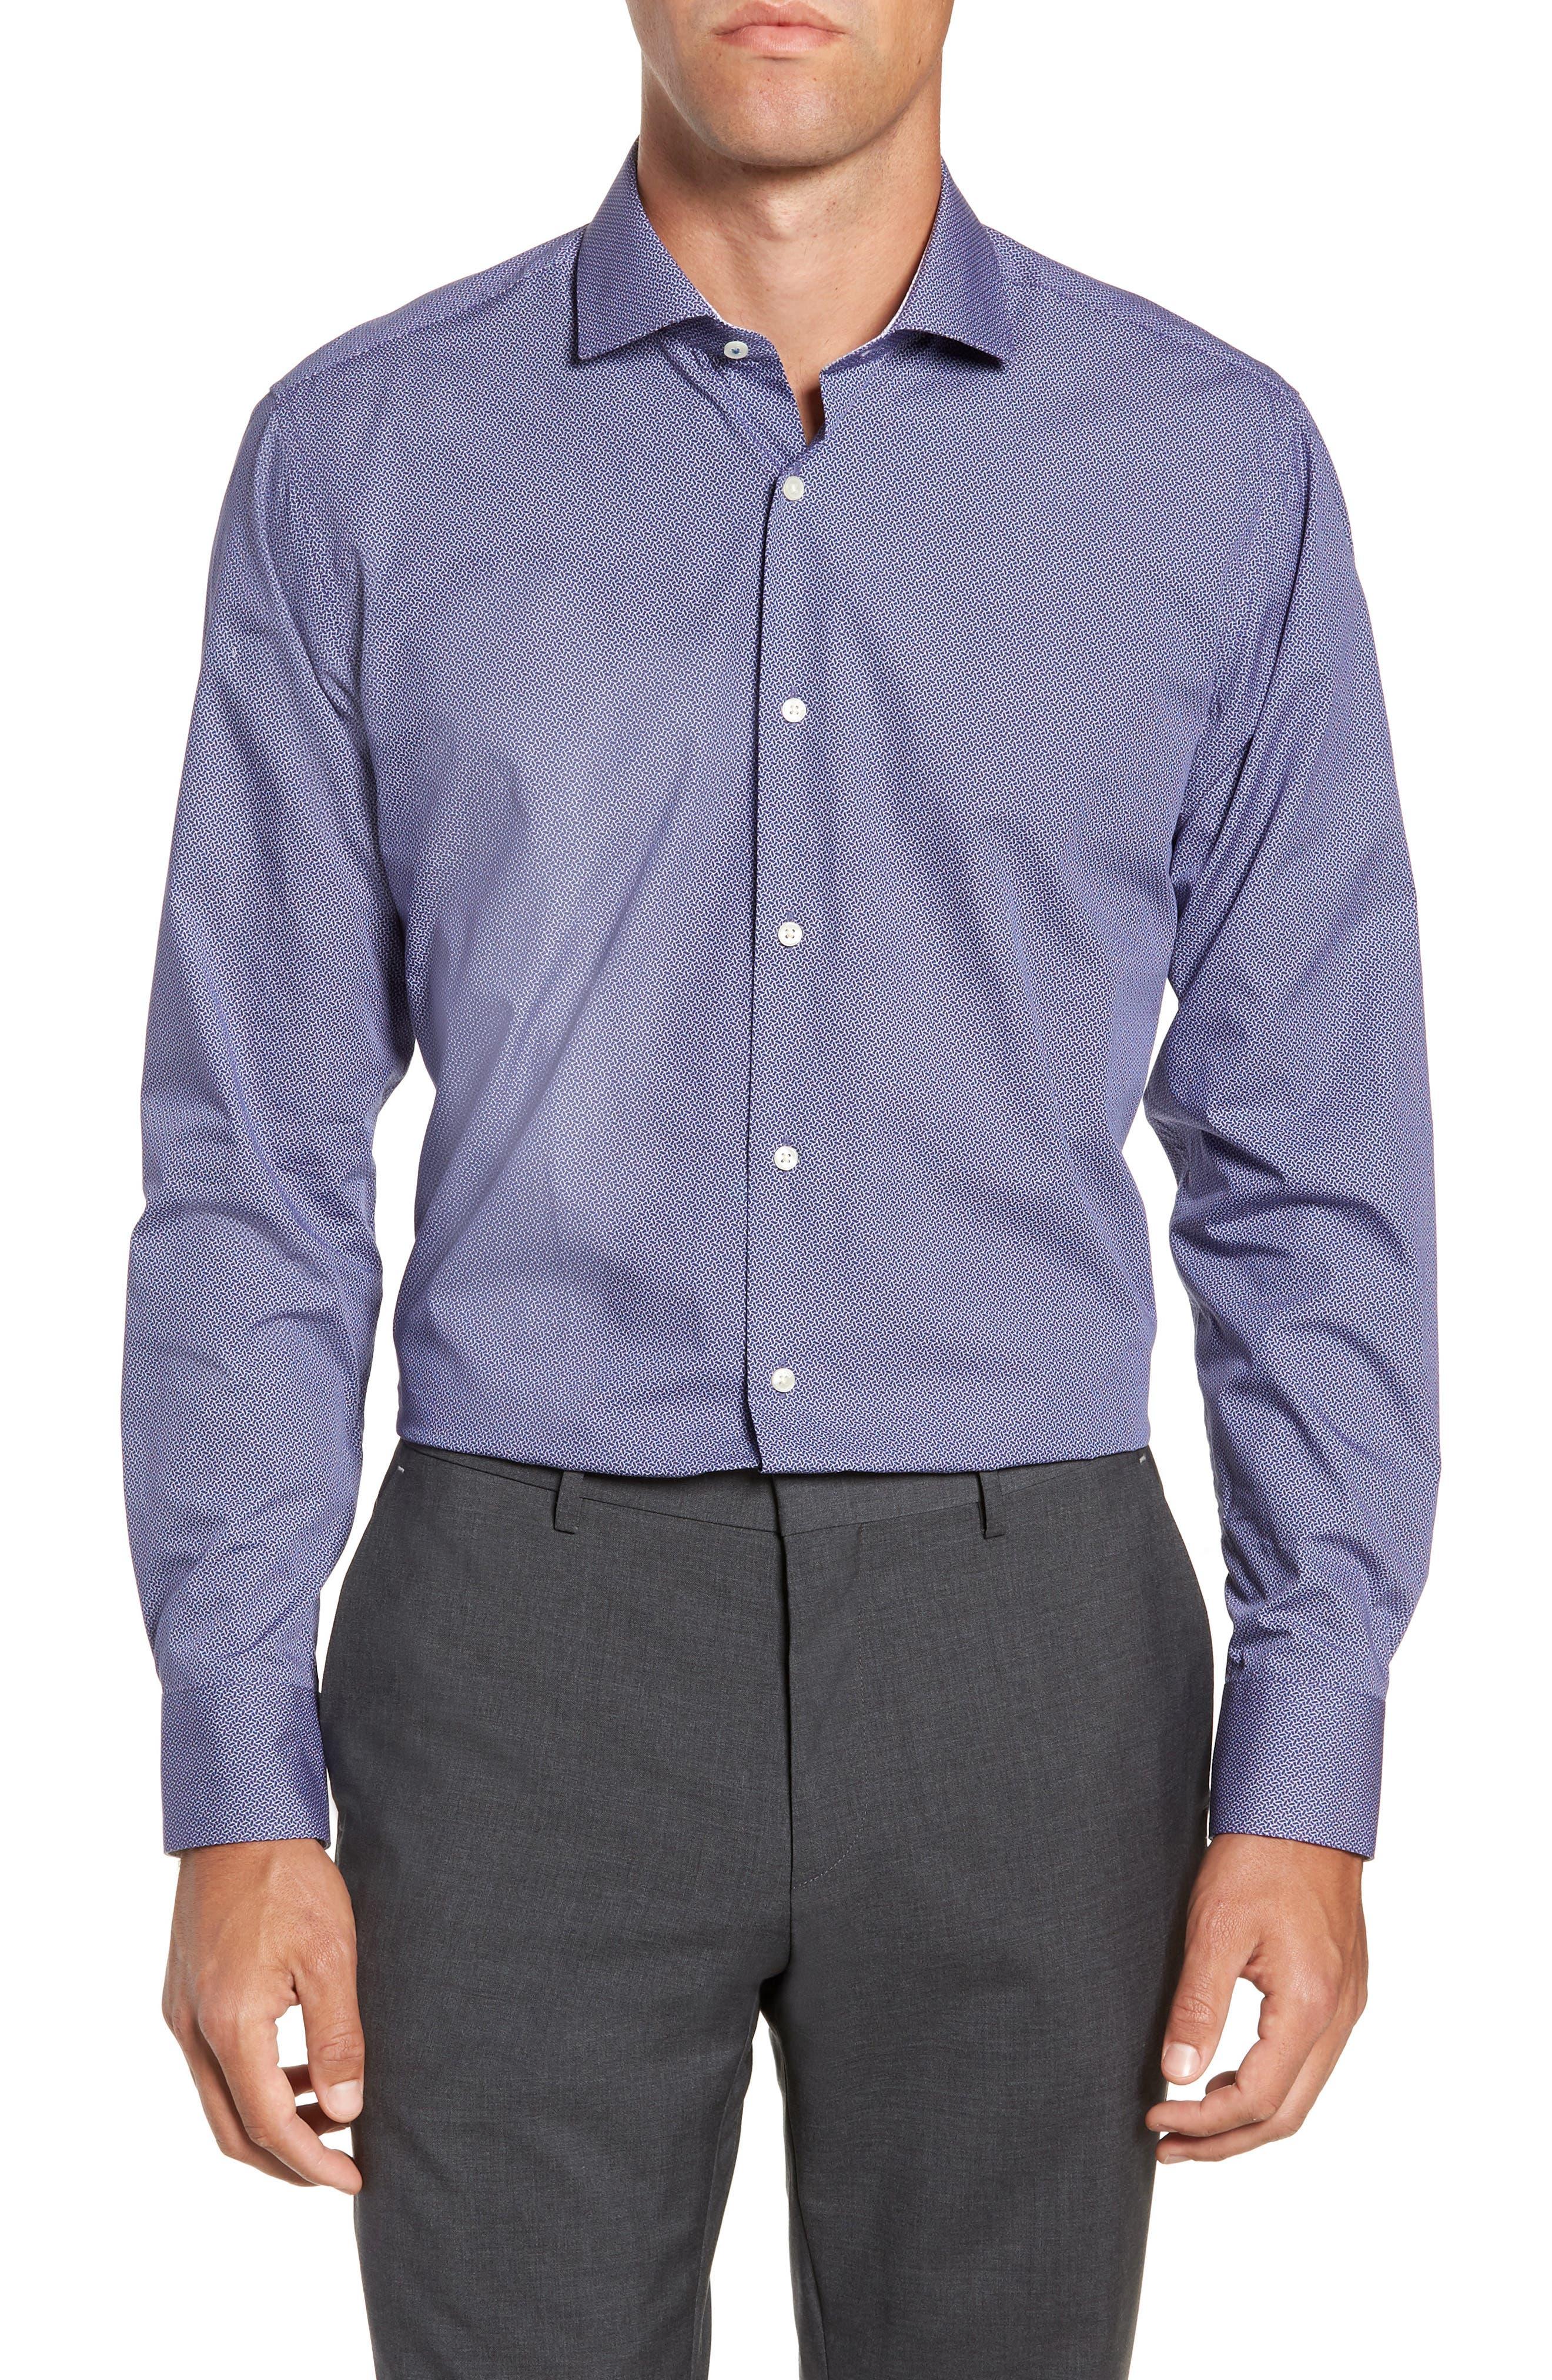 Strame Slim Fit Geometric Dress Shirt,                             Main thumbnail 1, color,                             510